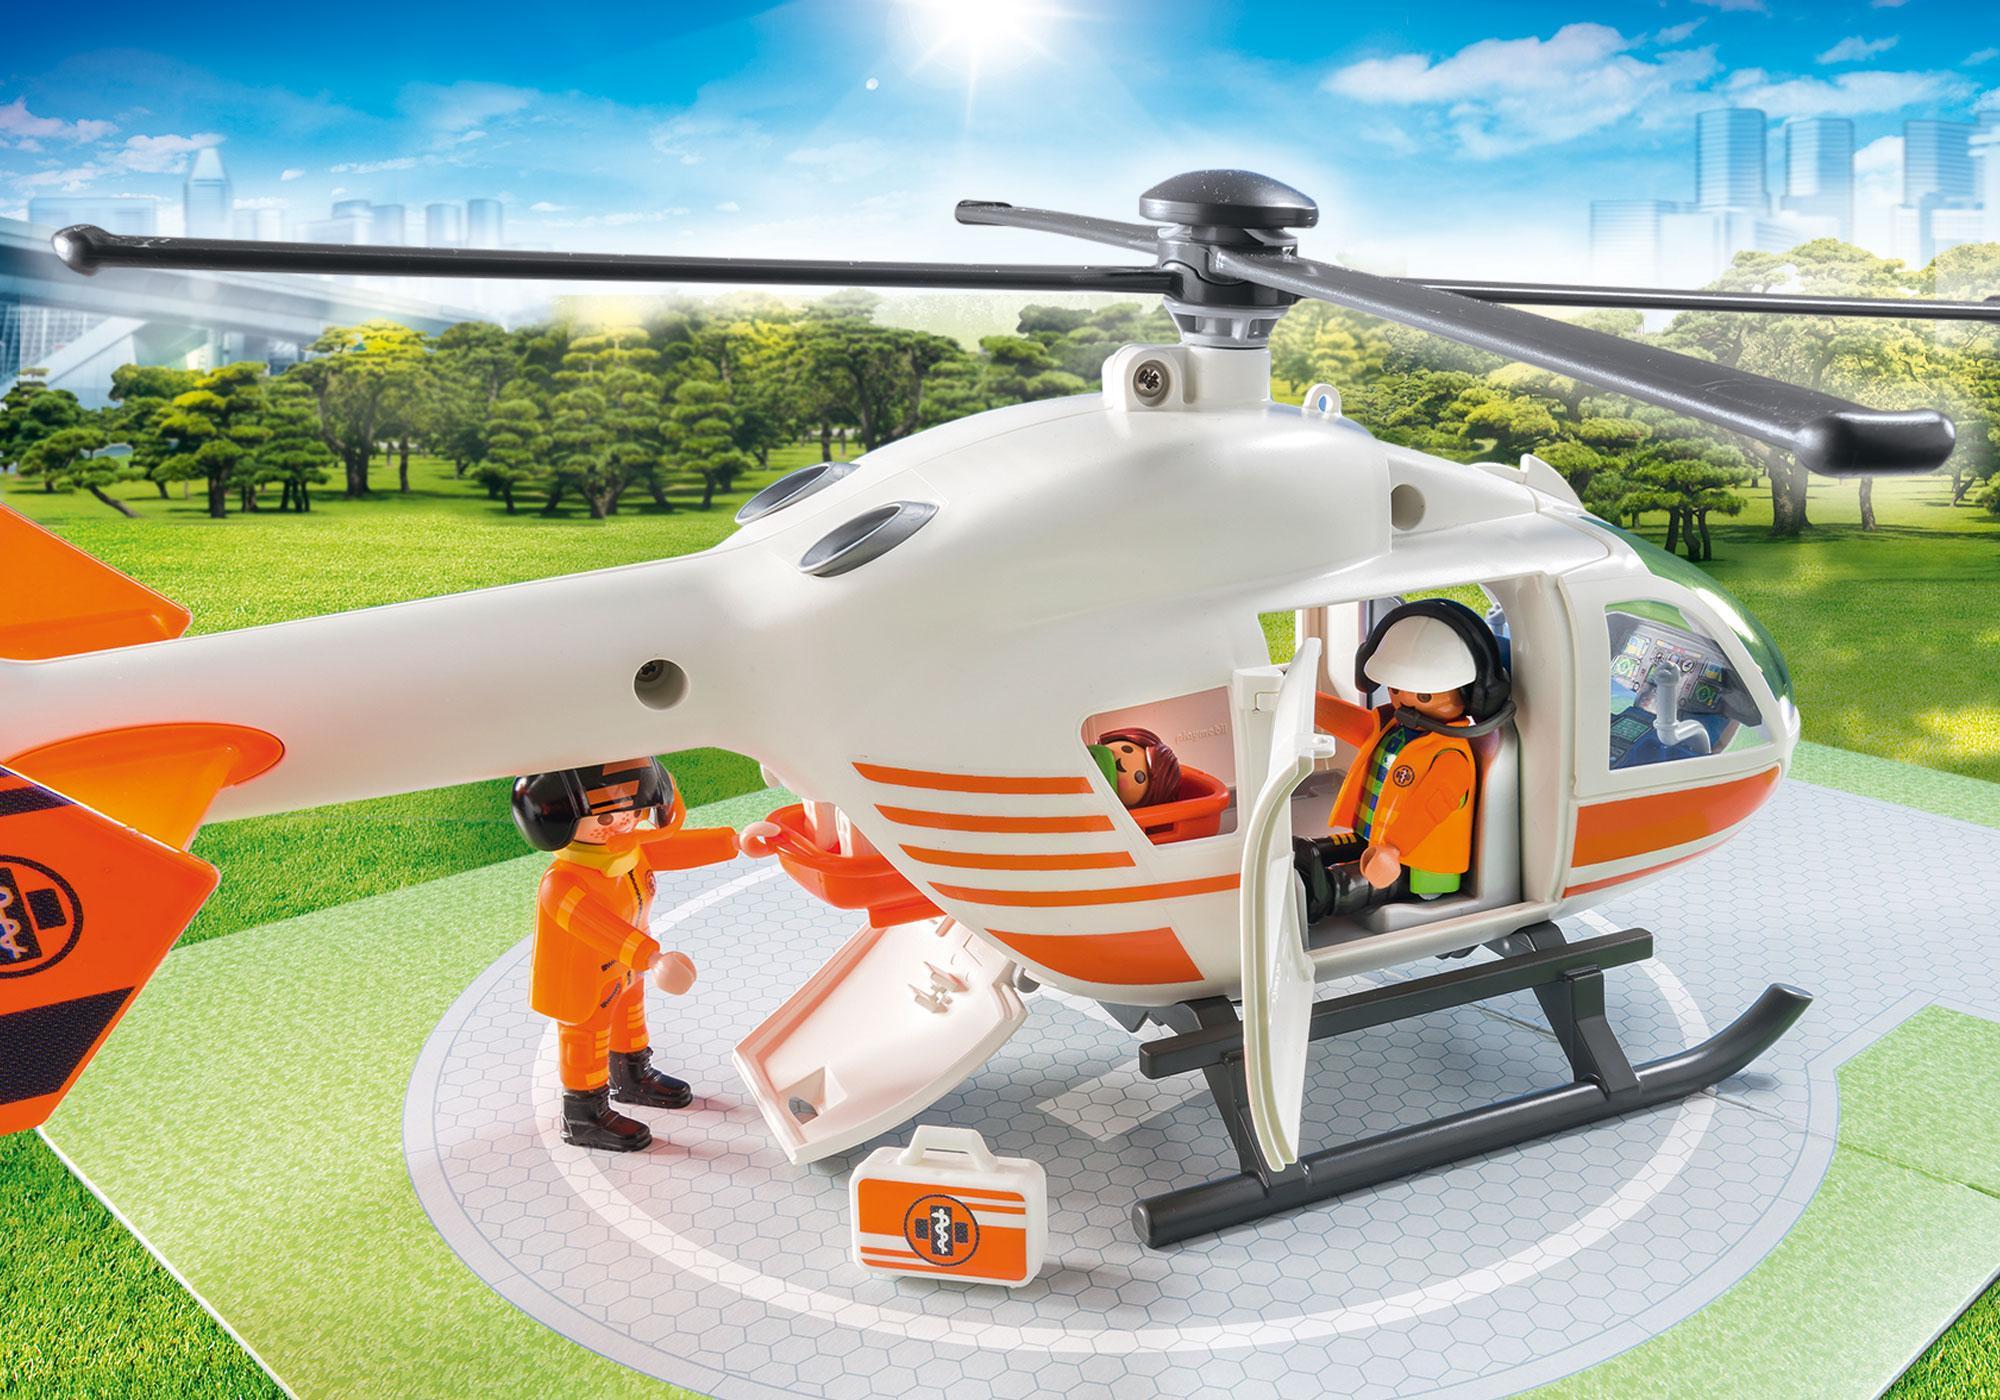 http://media.playmobil.com/i/playmobil/70048_product_extra2/Rettungshelikopter